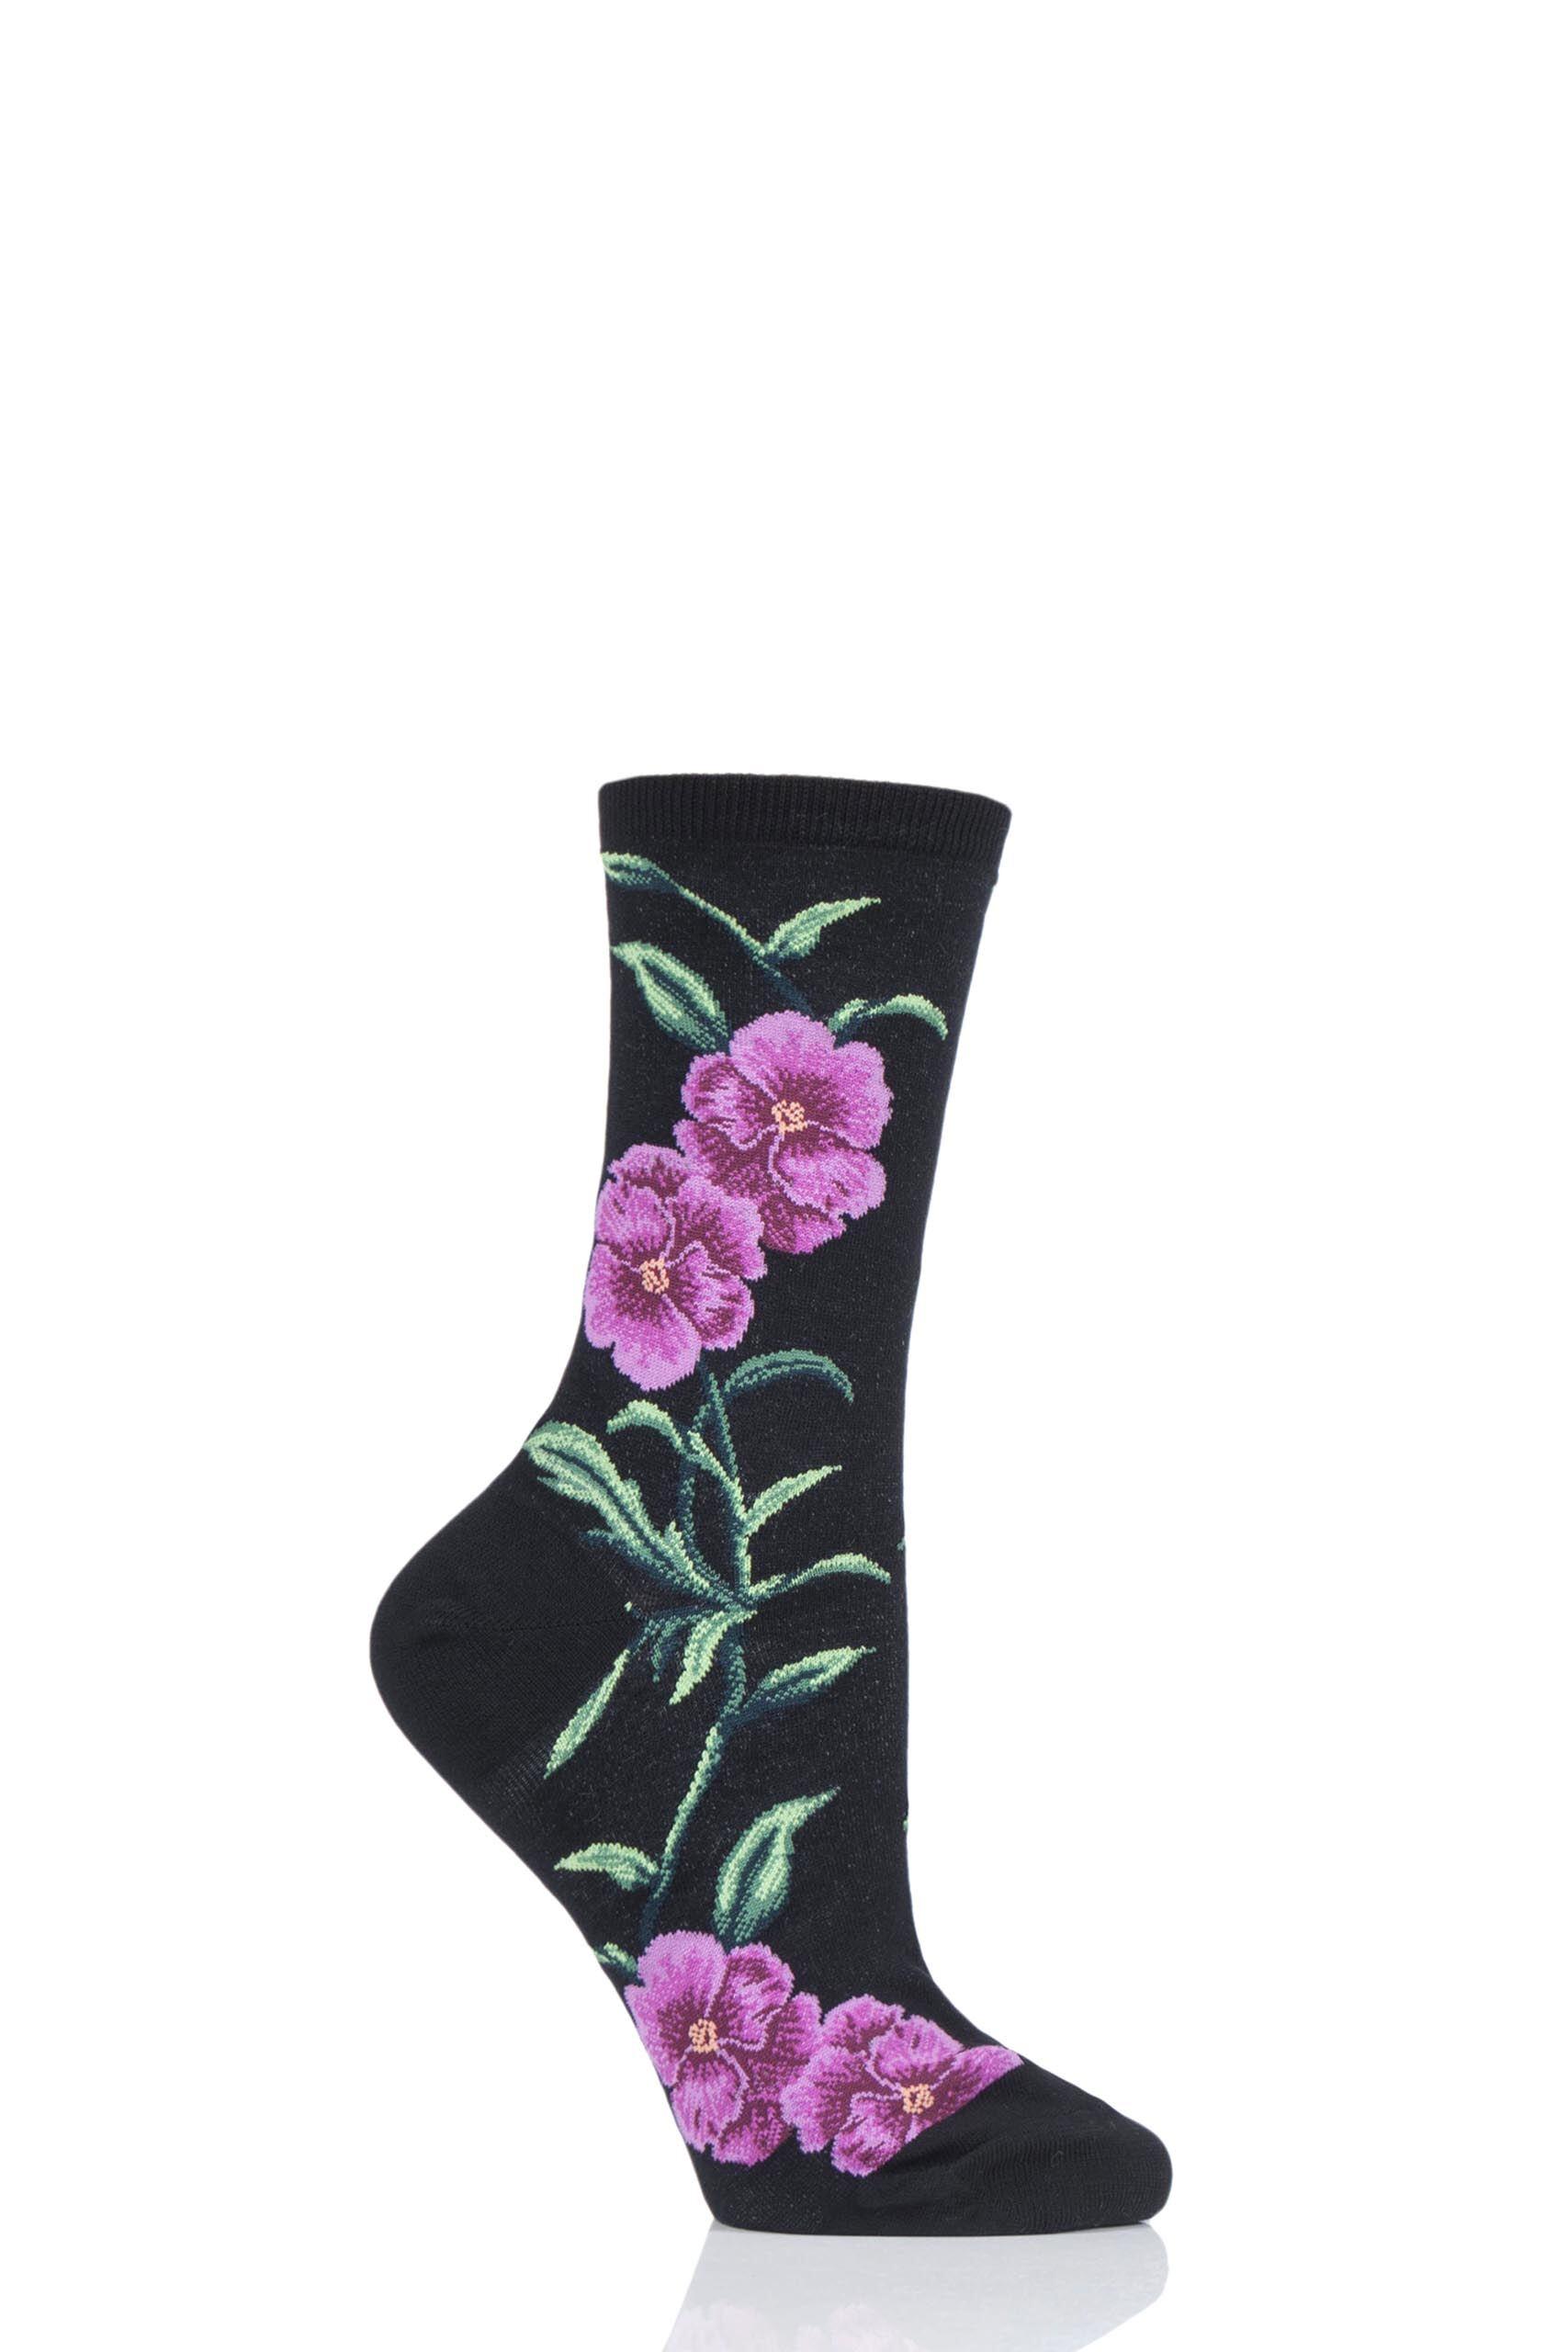 Image of 1 Pair Black HotSox Pansies All Over Flower Cotton Socks Ladies 4-9 Ladies - Hot Sox